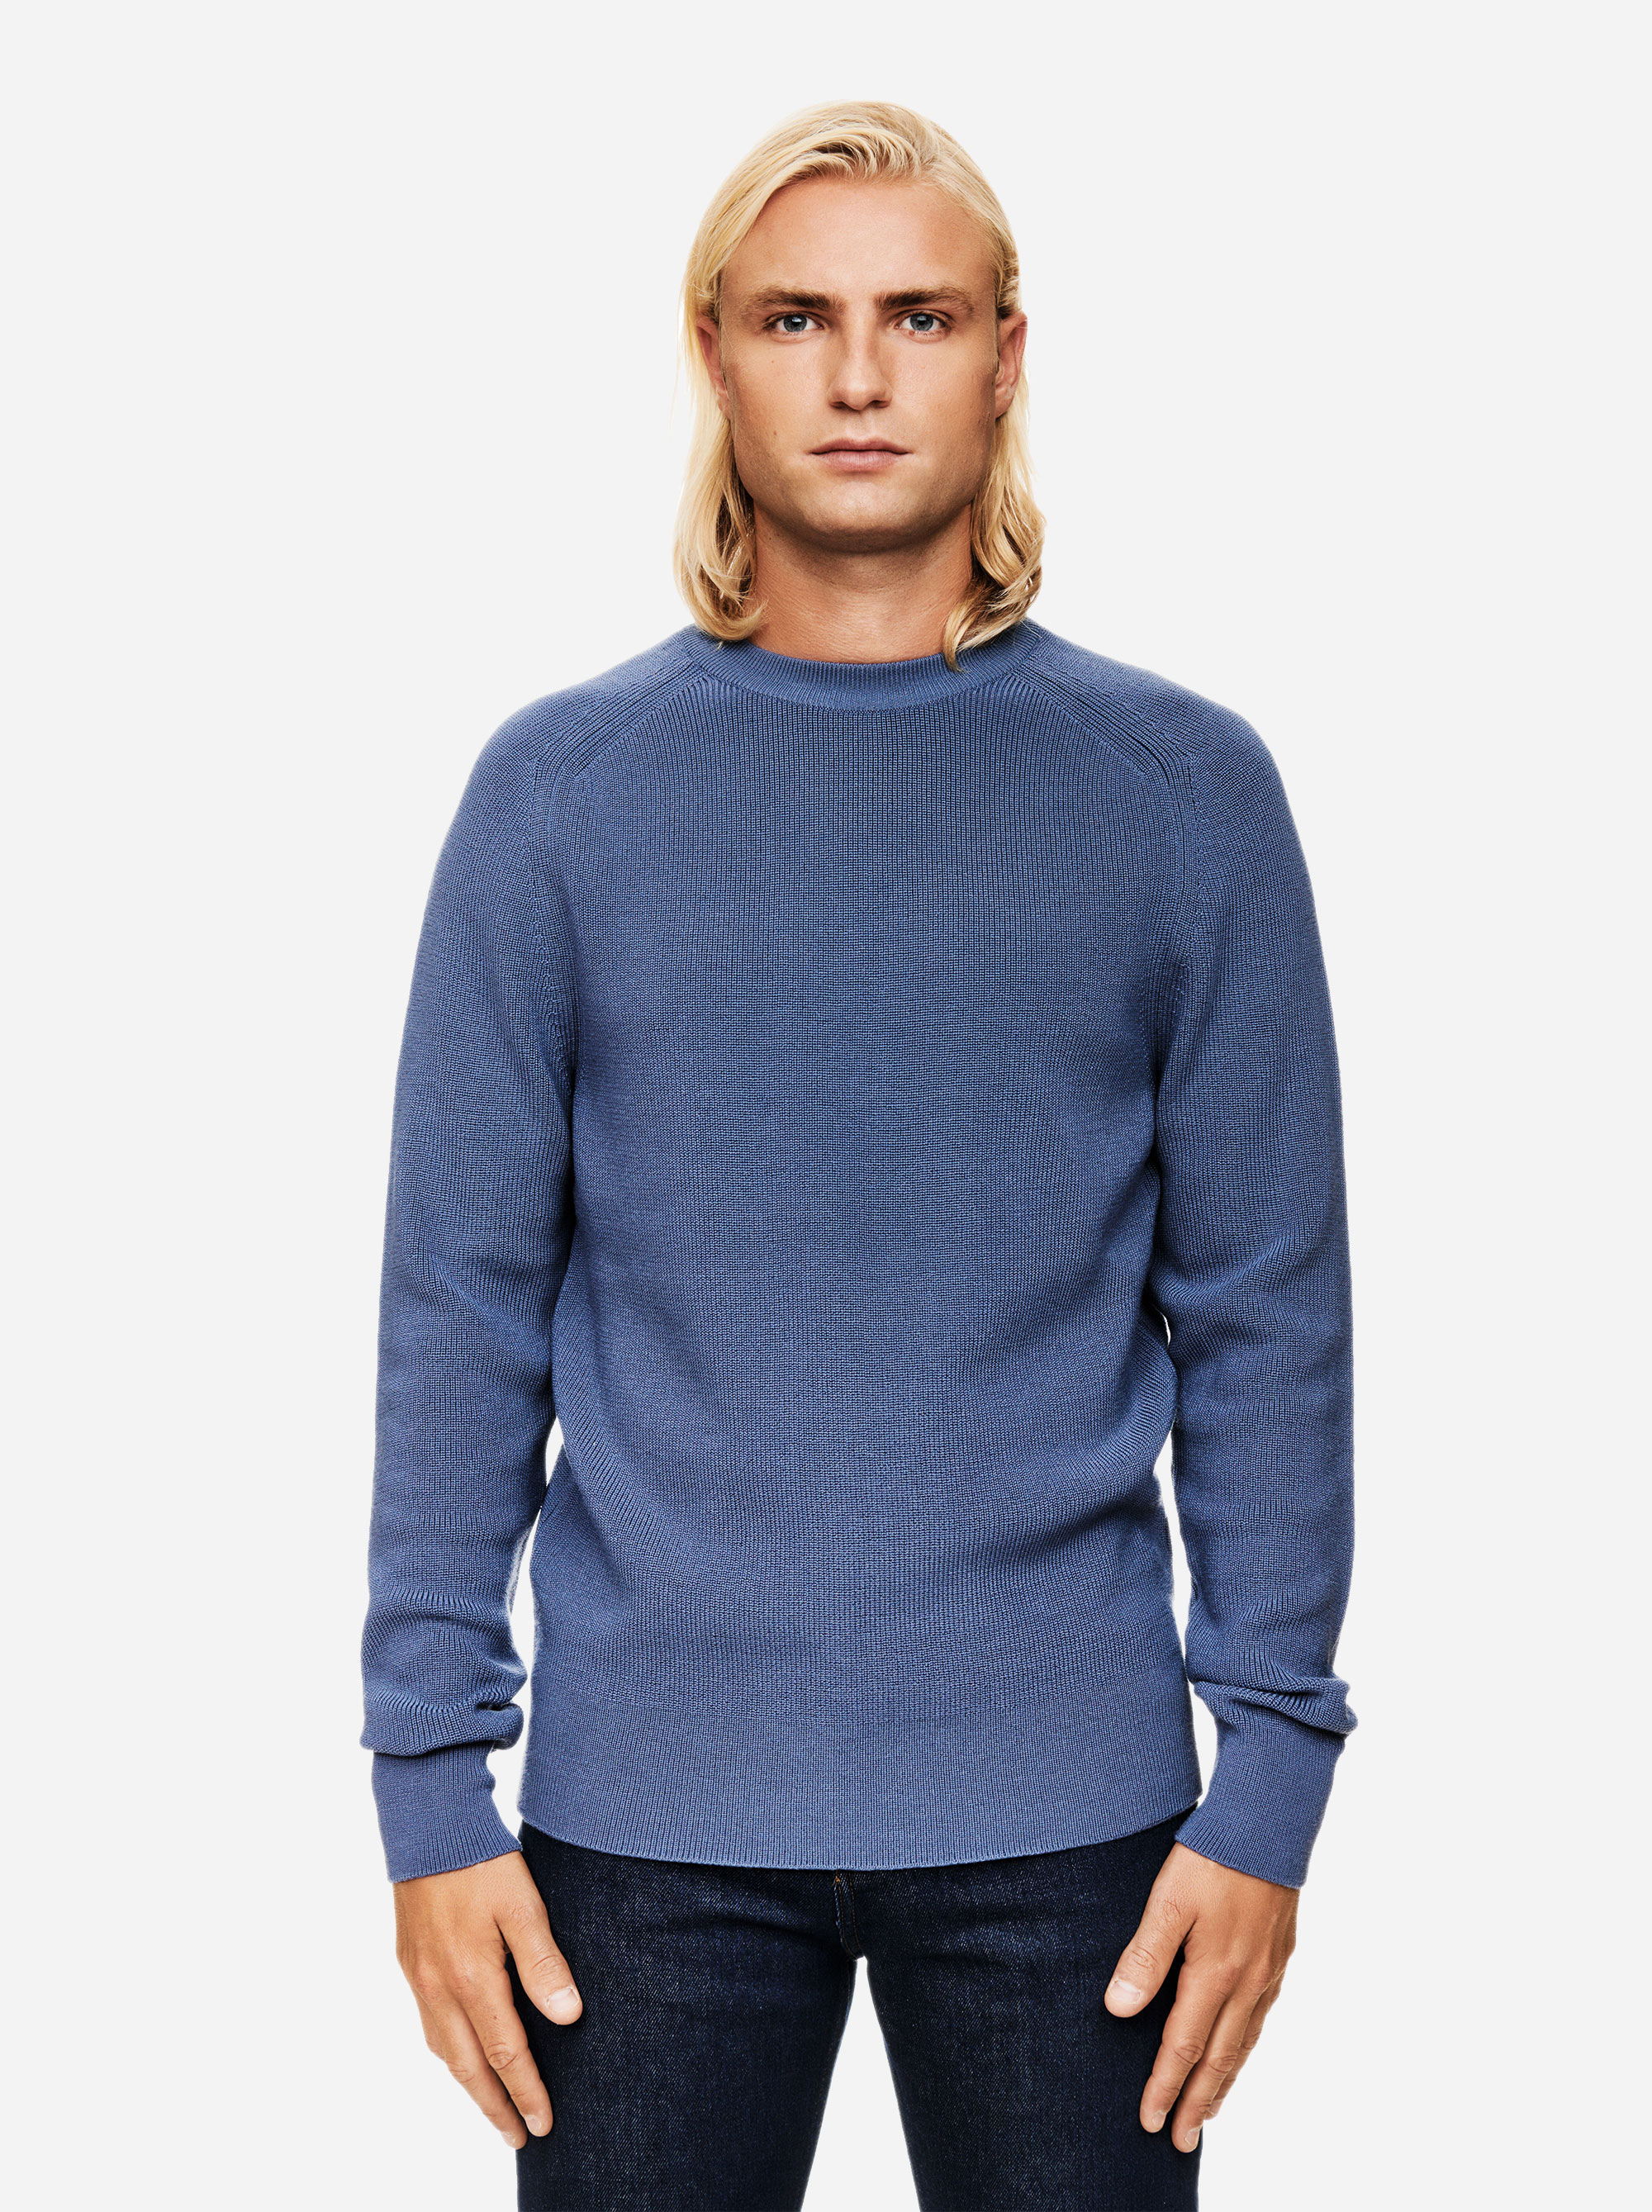 Teym - The Merino Sweater - Men - Sky blue - 1